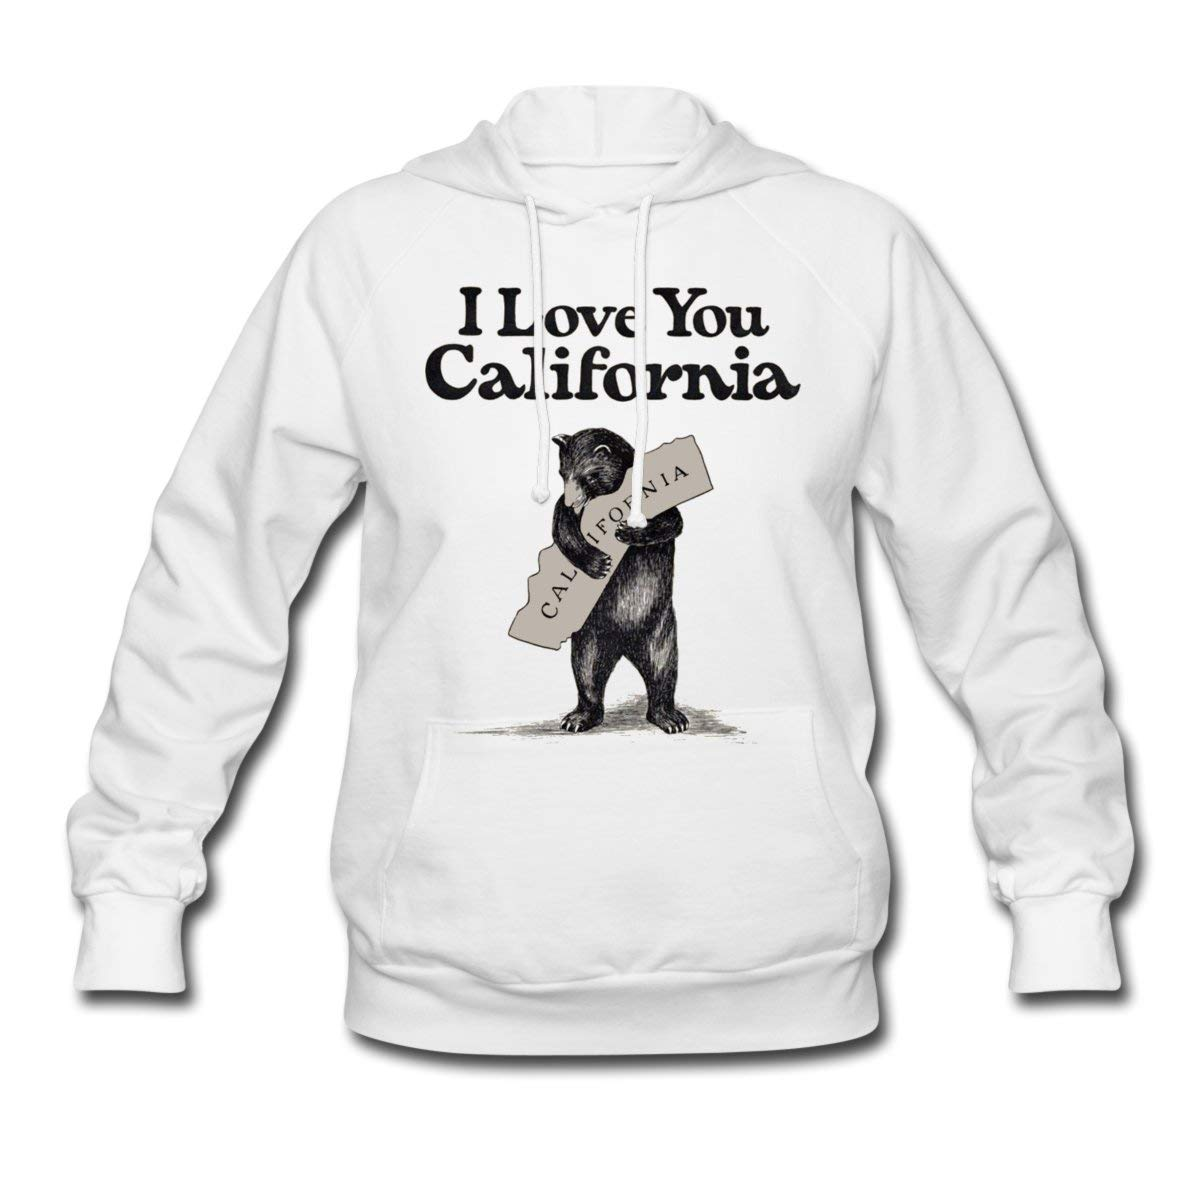 I Love You California 2382 Shirts